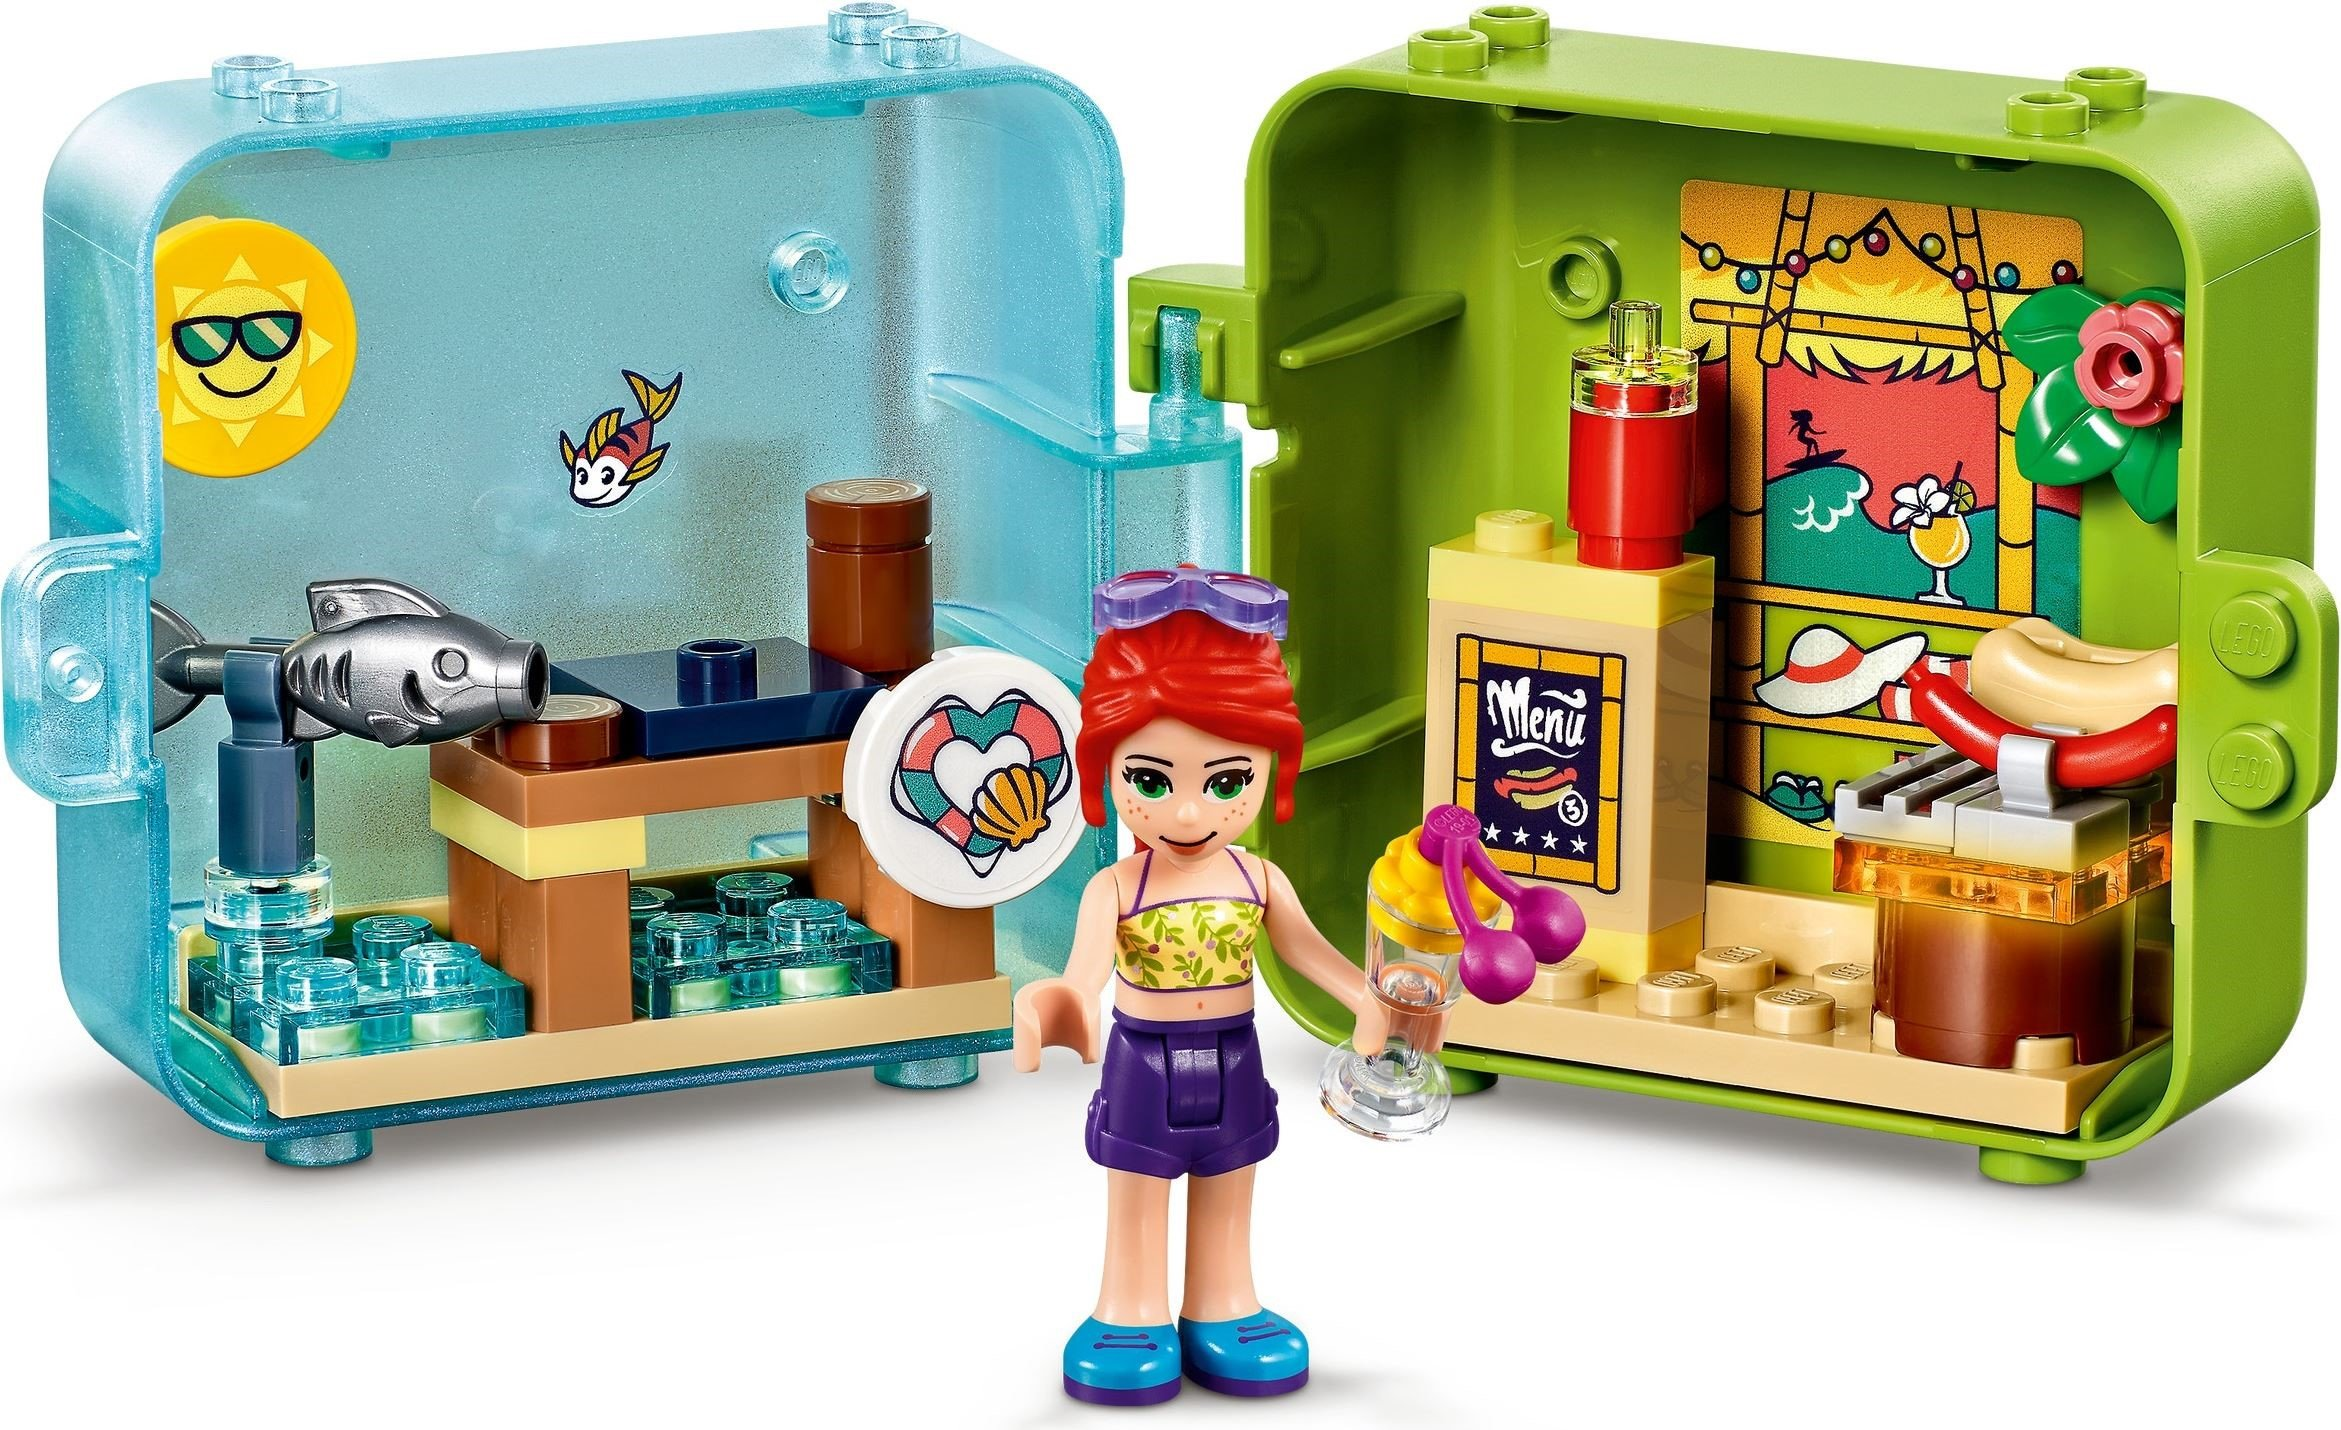 LEGO Friends - Mia's Summer Play Cube (41413)